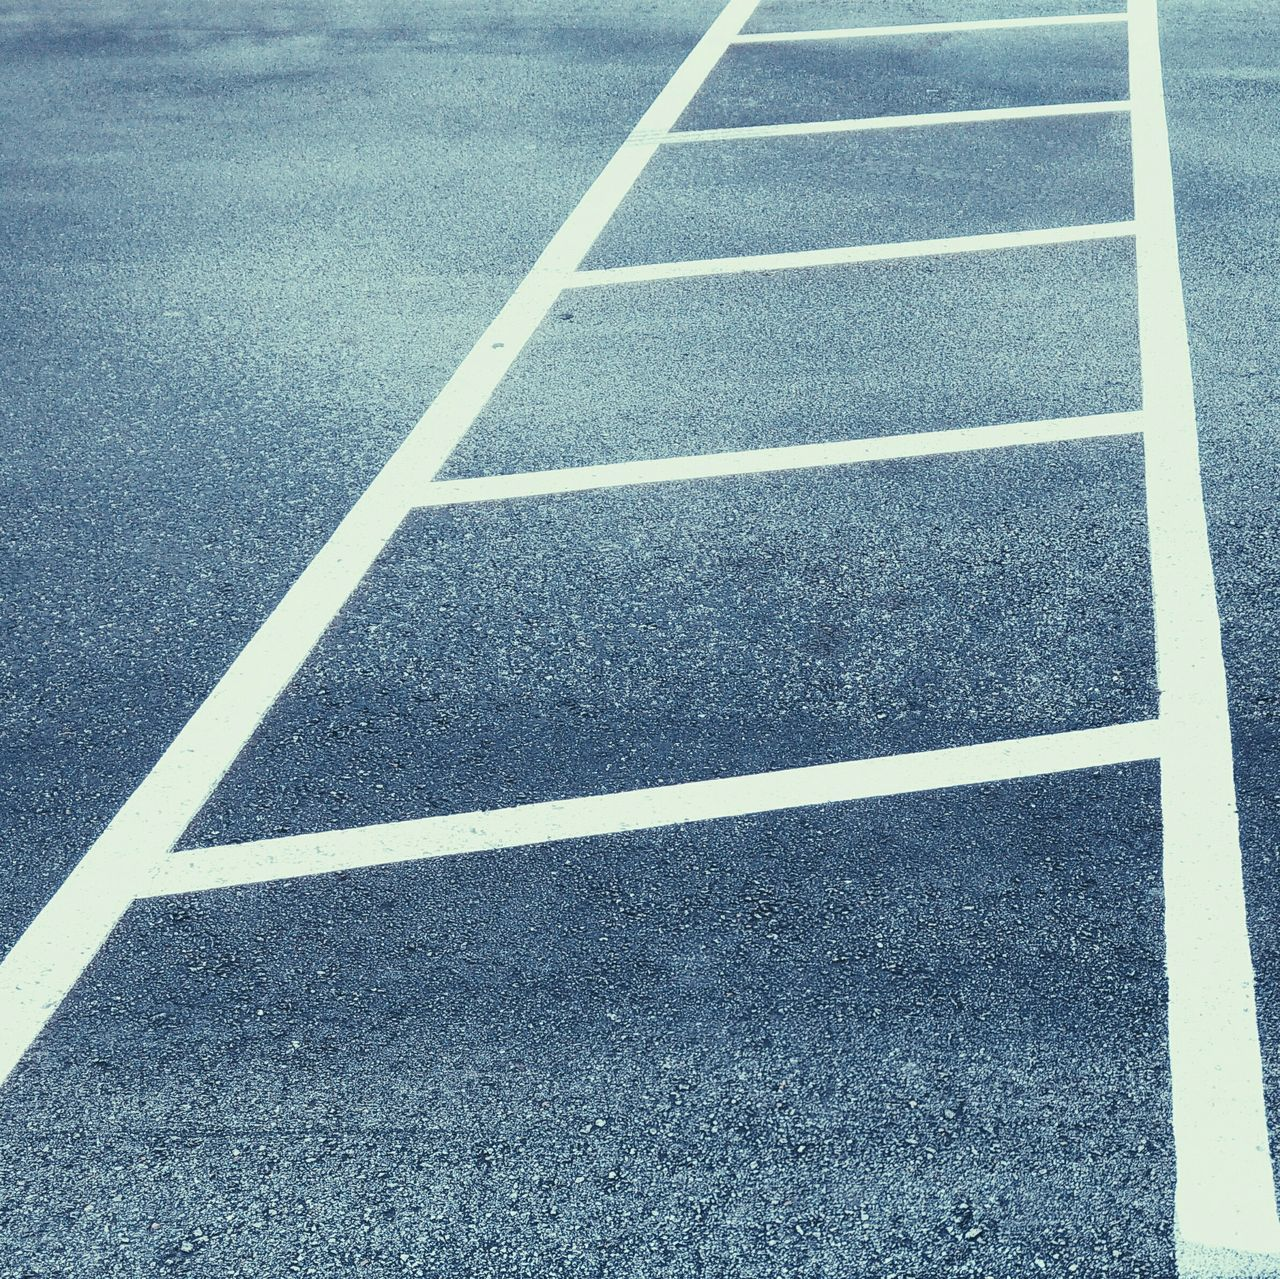 Streetphotography Lines Pavement Minimalist Grey Urban Mobilephotography